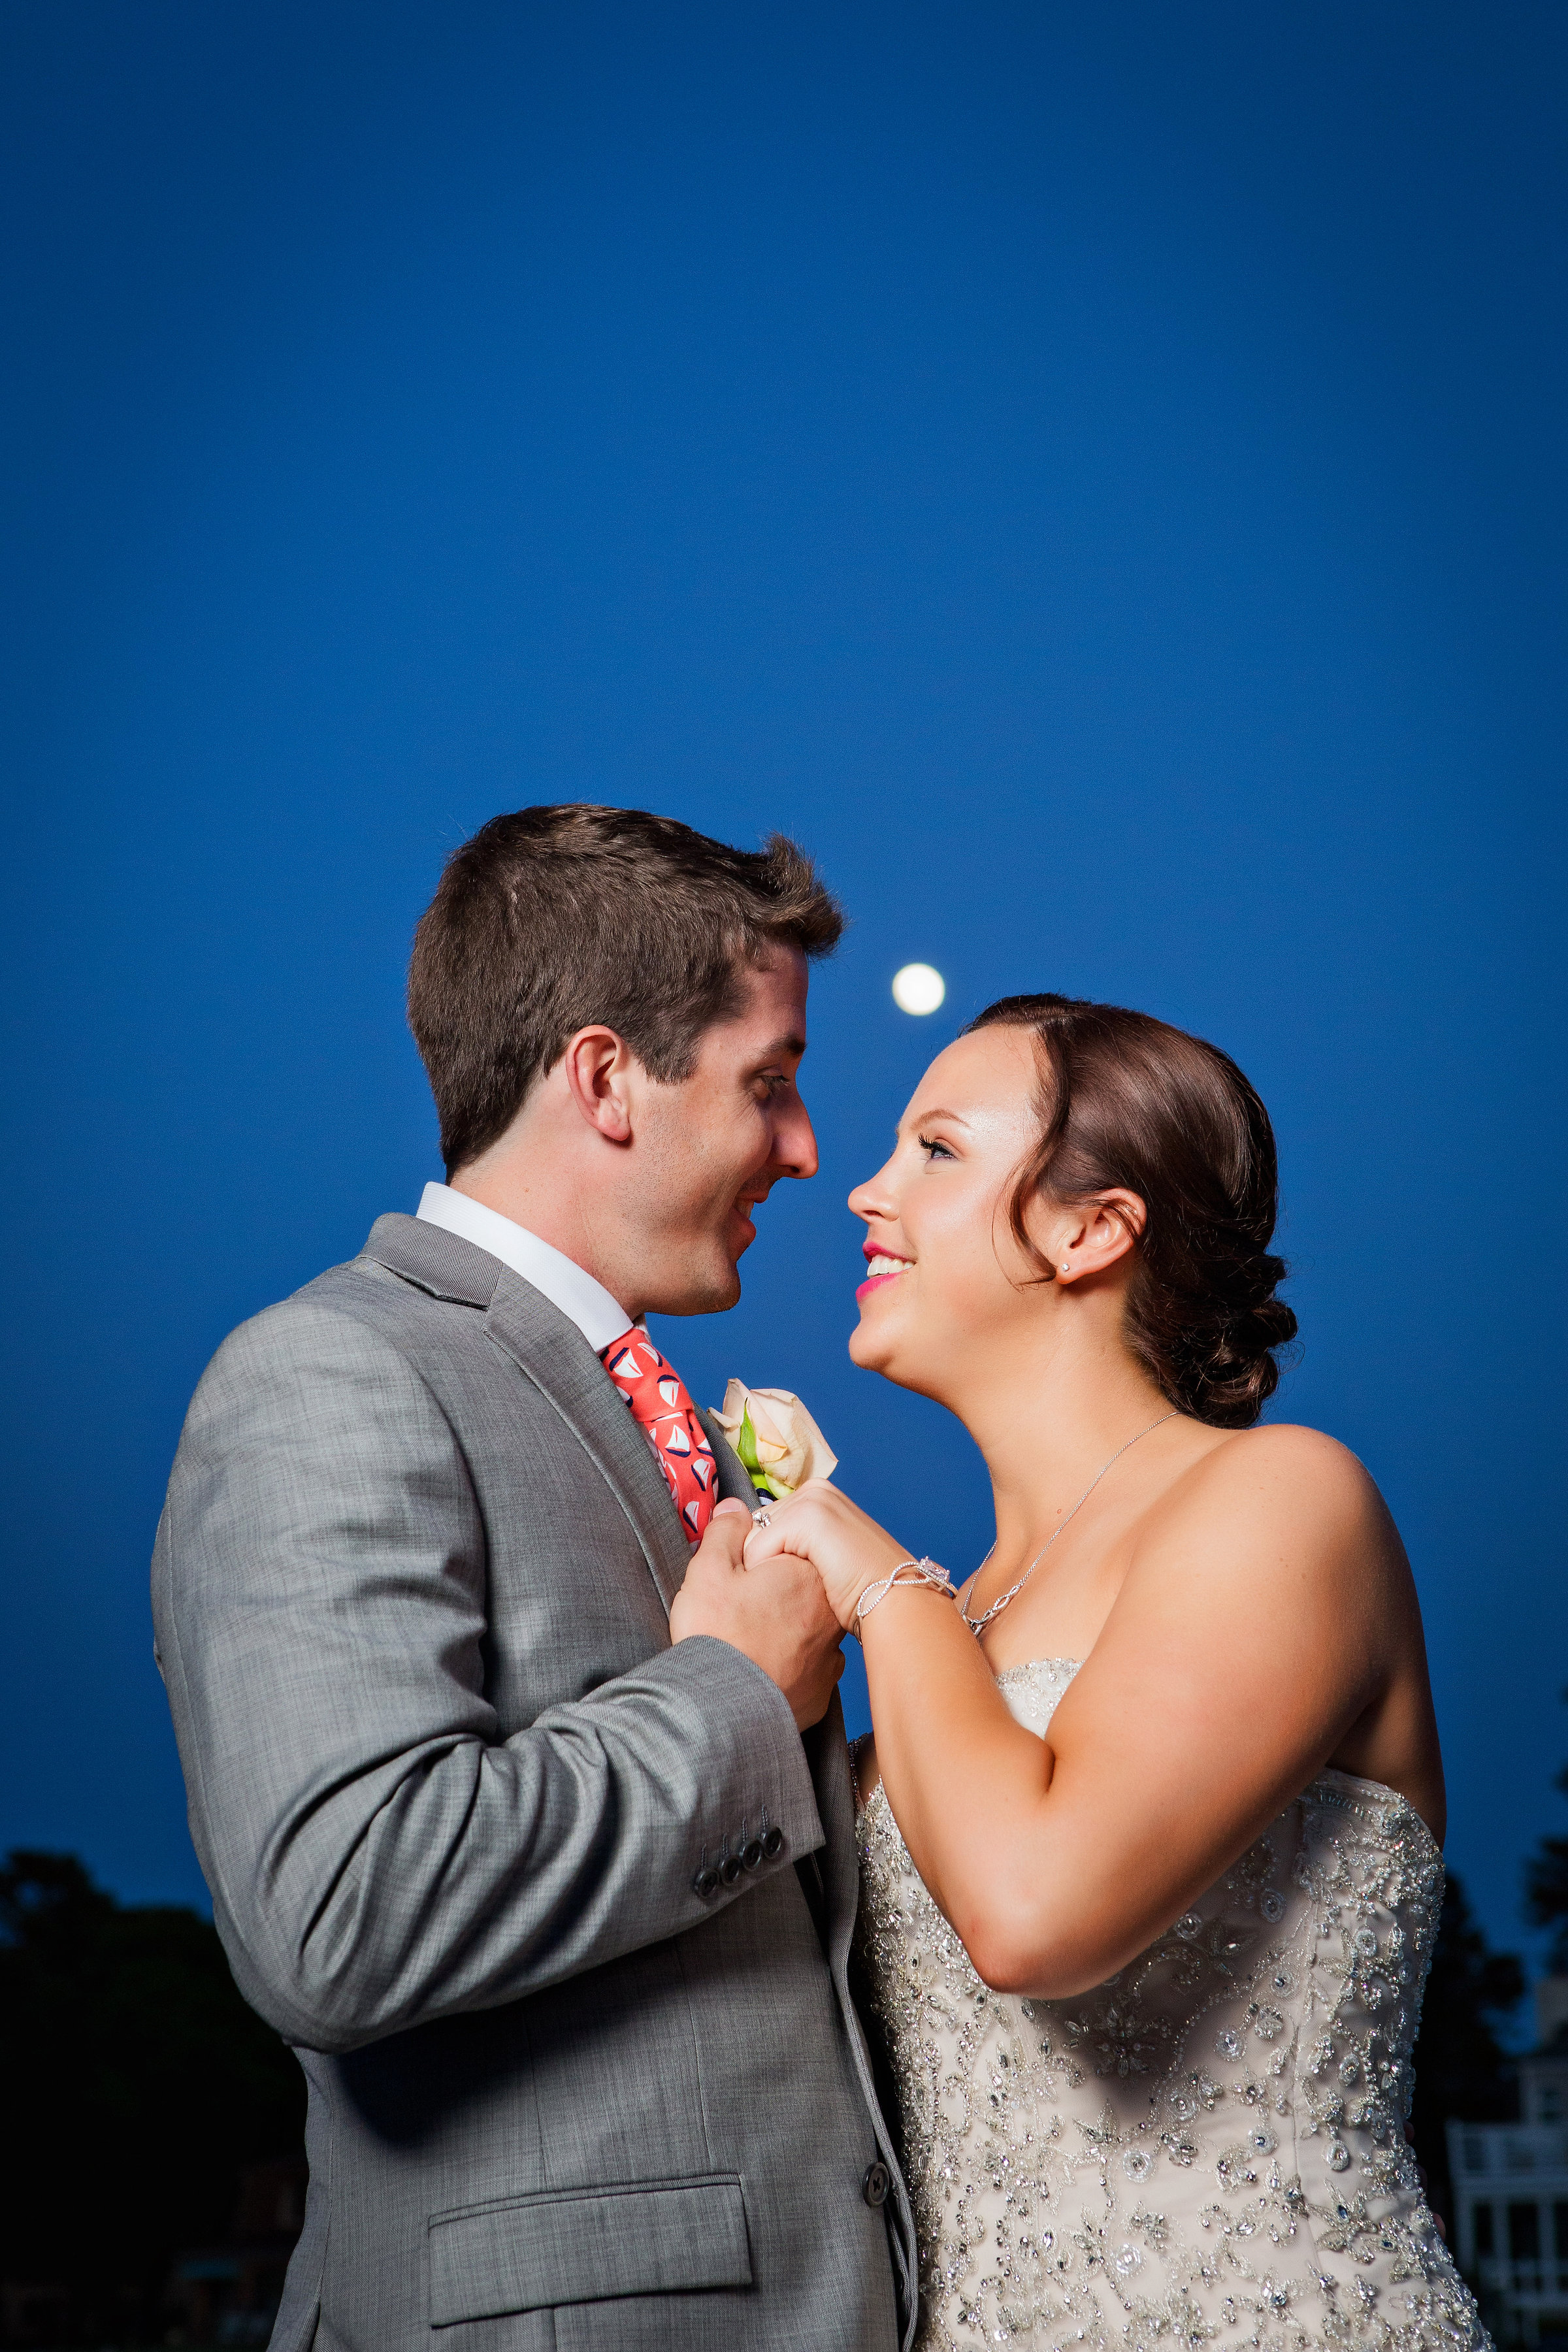 Marina Shores Wedding Photograph - Virginia Beach - Ashley And Tommy -by John Cachero for Ross Costanza Photography